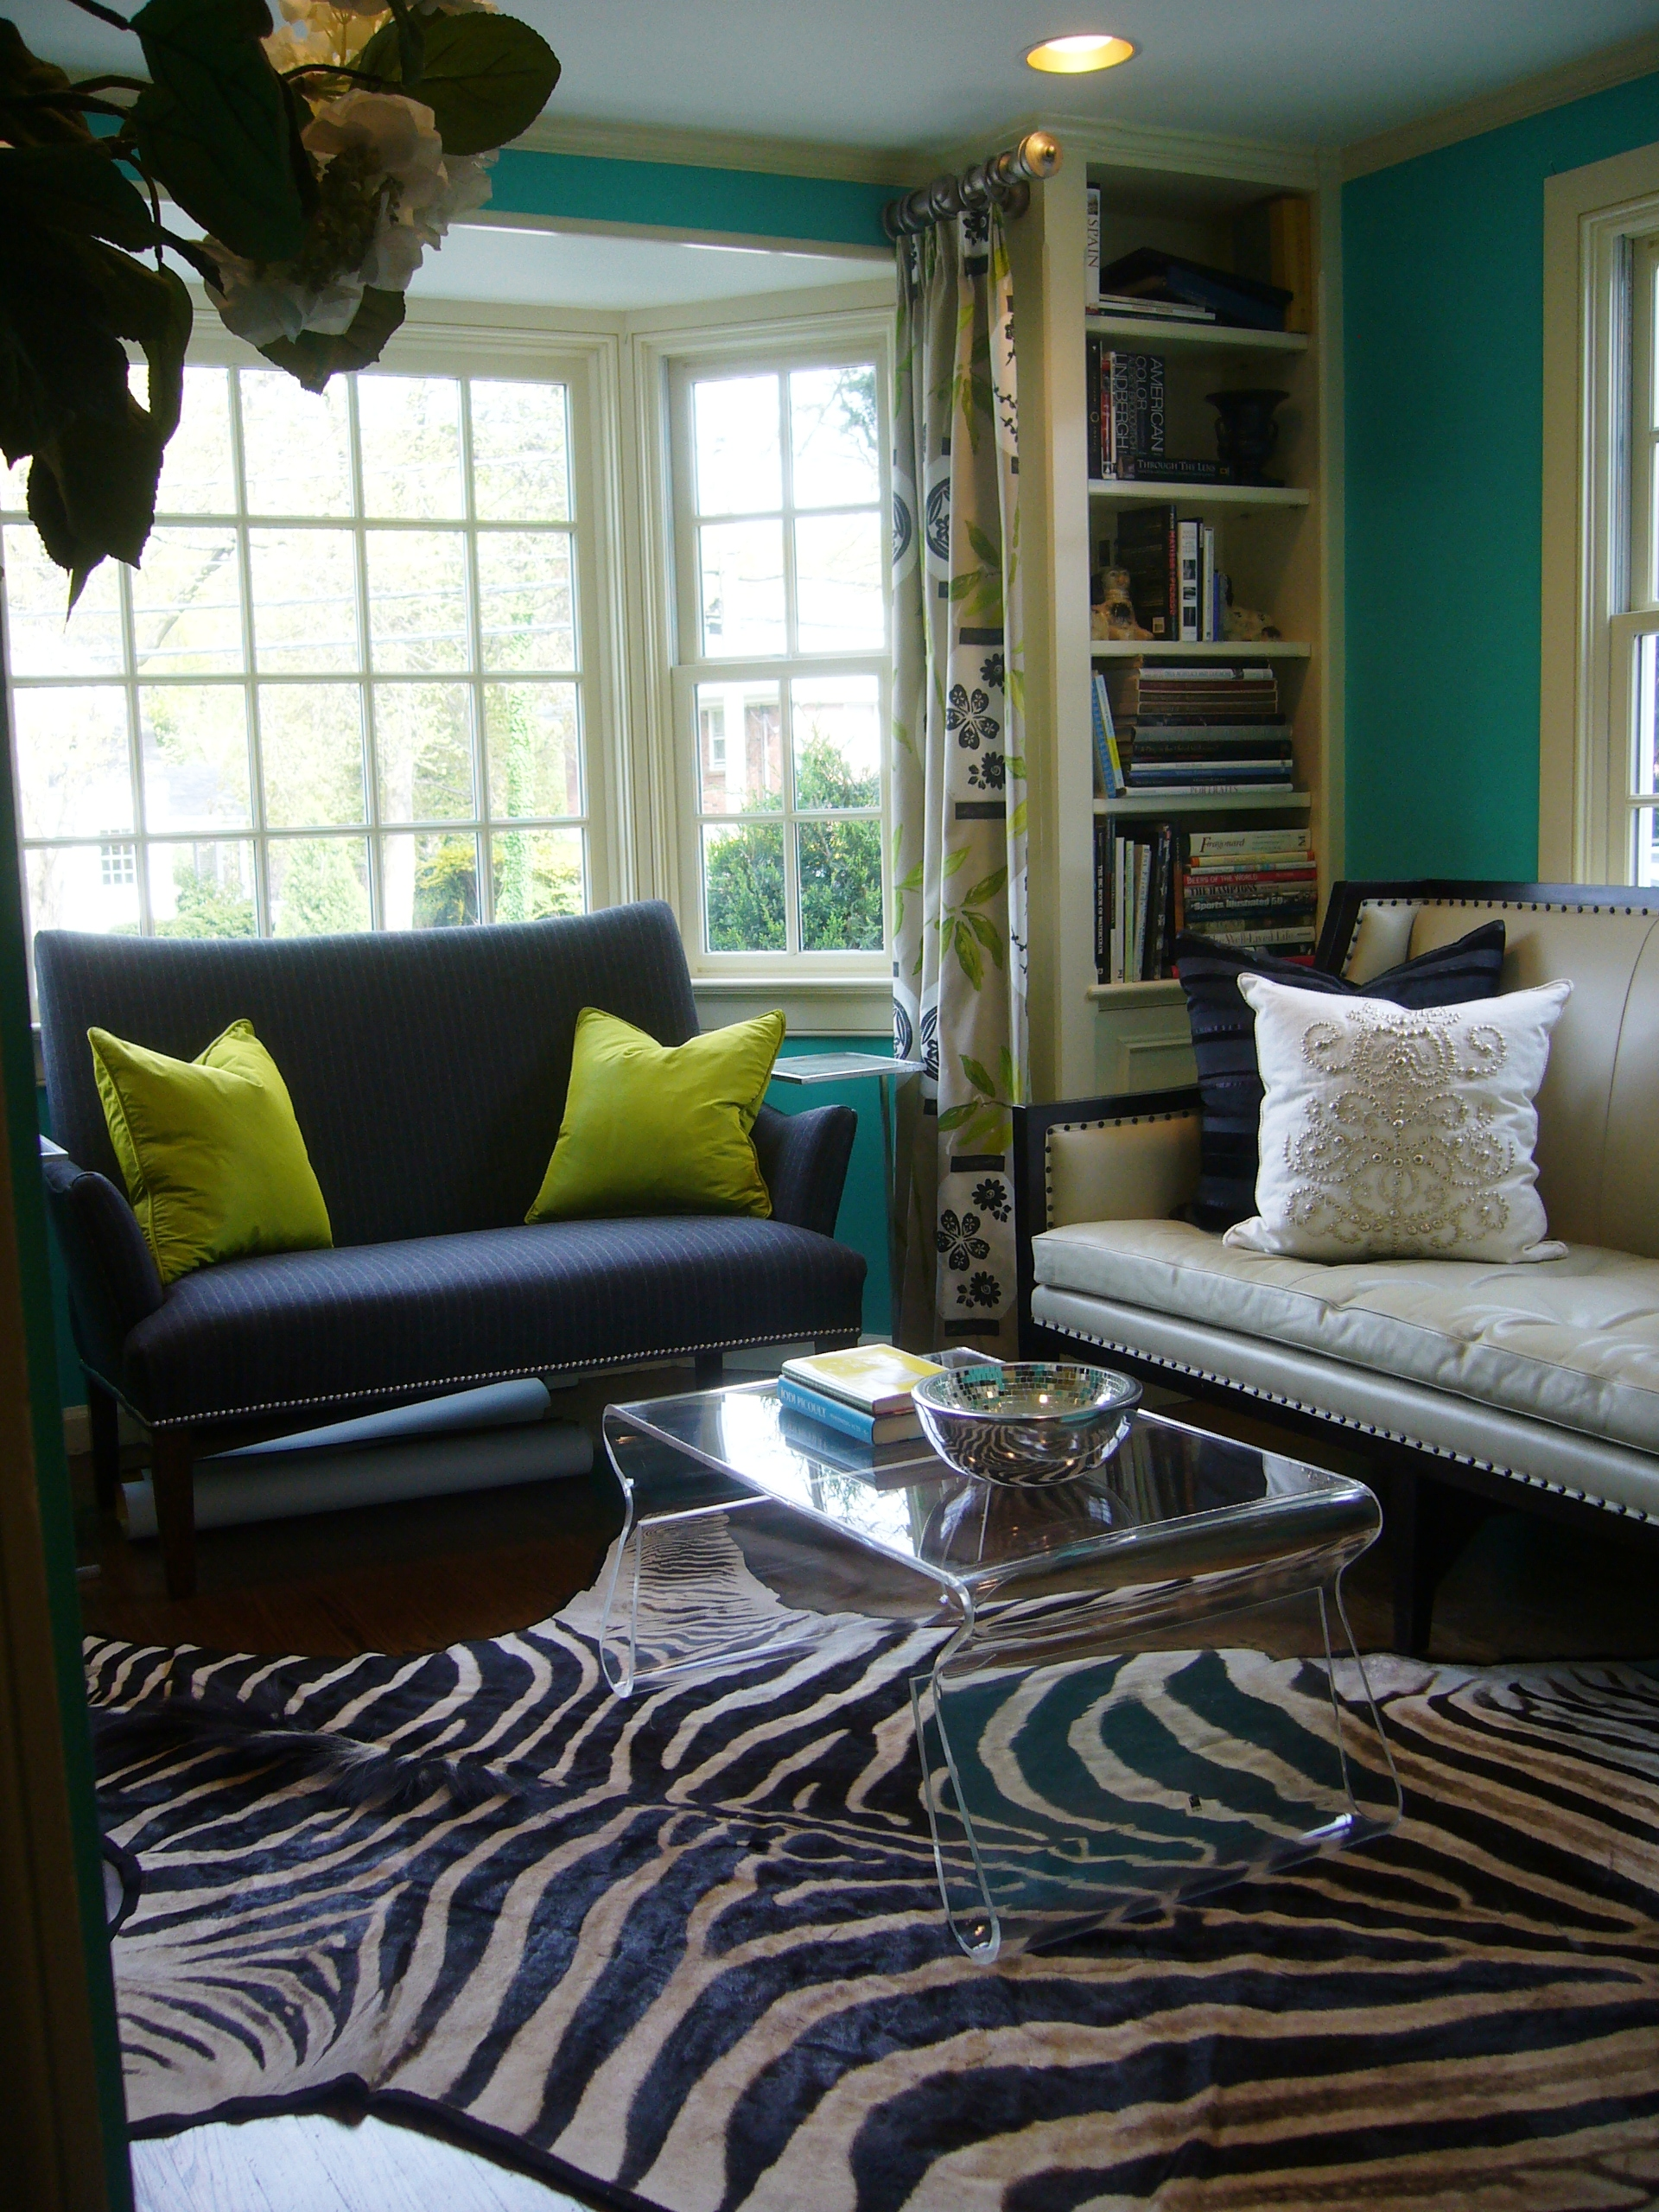 Copy of Living Room D'Angeli.JPG